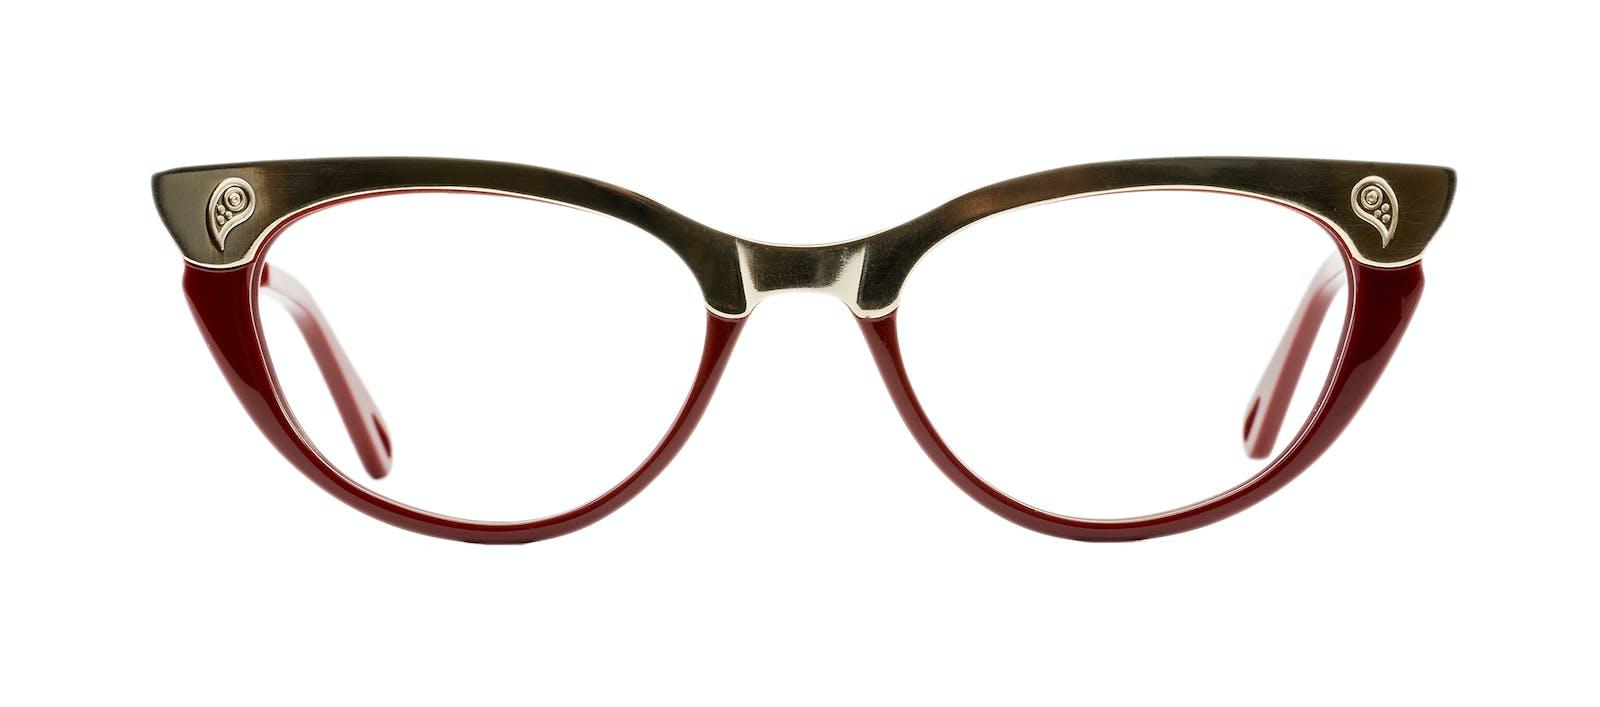 cec31d266dd Affordable Fashion Glasses Cat Eye Daring Cateye Eyeglasses Women Bad Beti  Paro Front